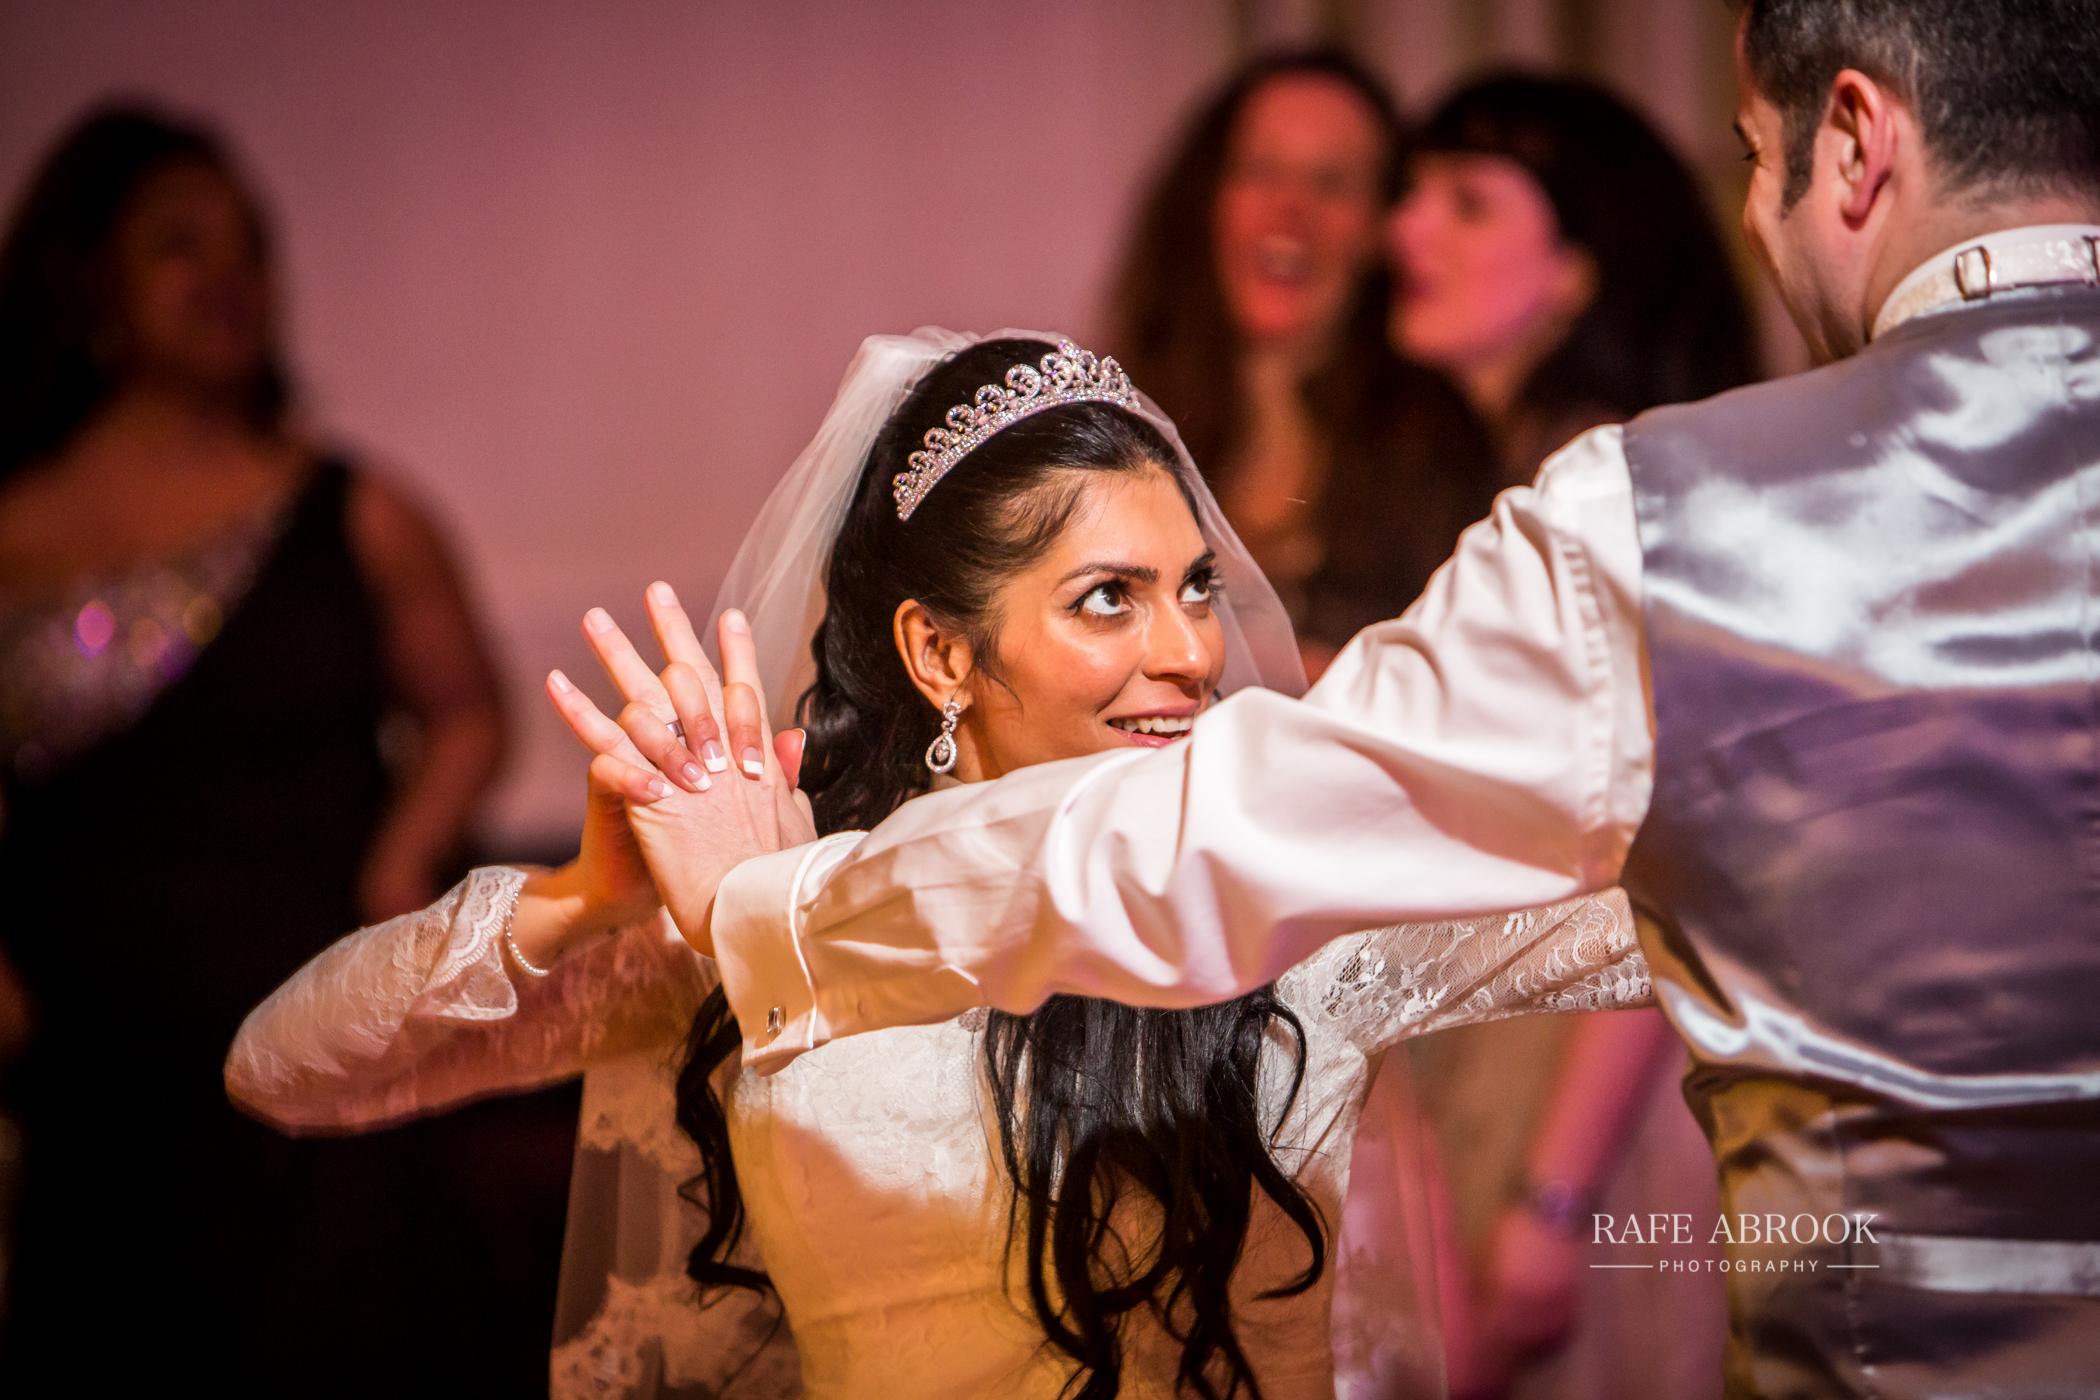 roma & pete wedding hampstead shenley hertfordshire -599.jpg